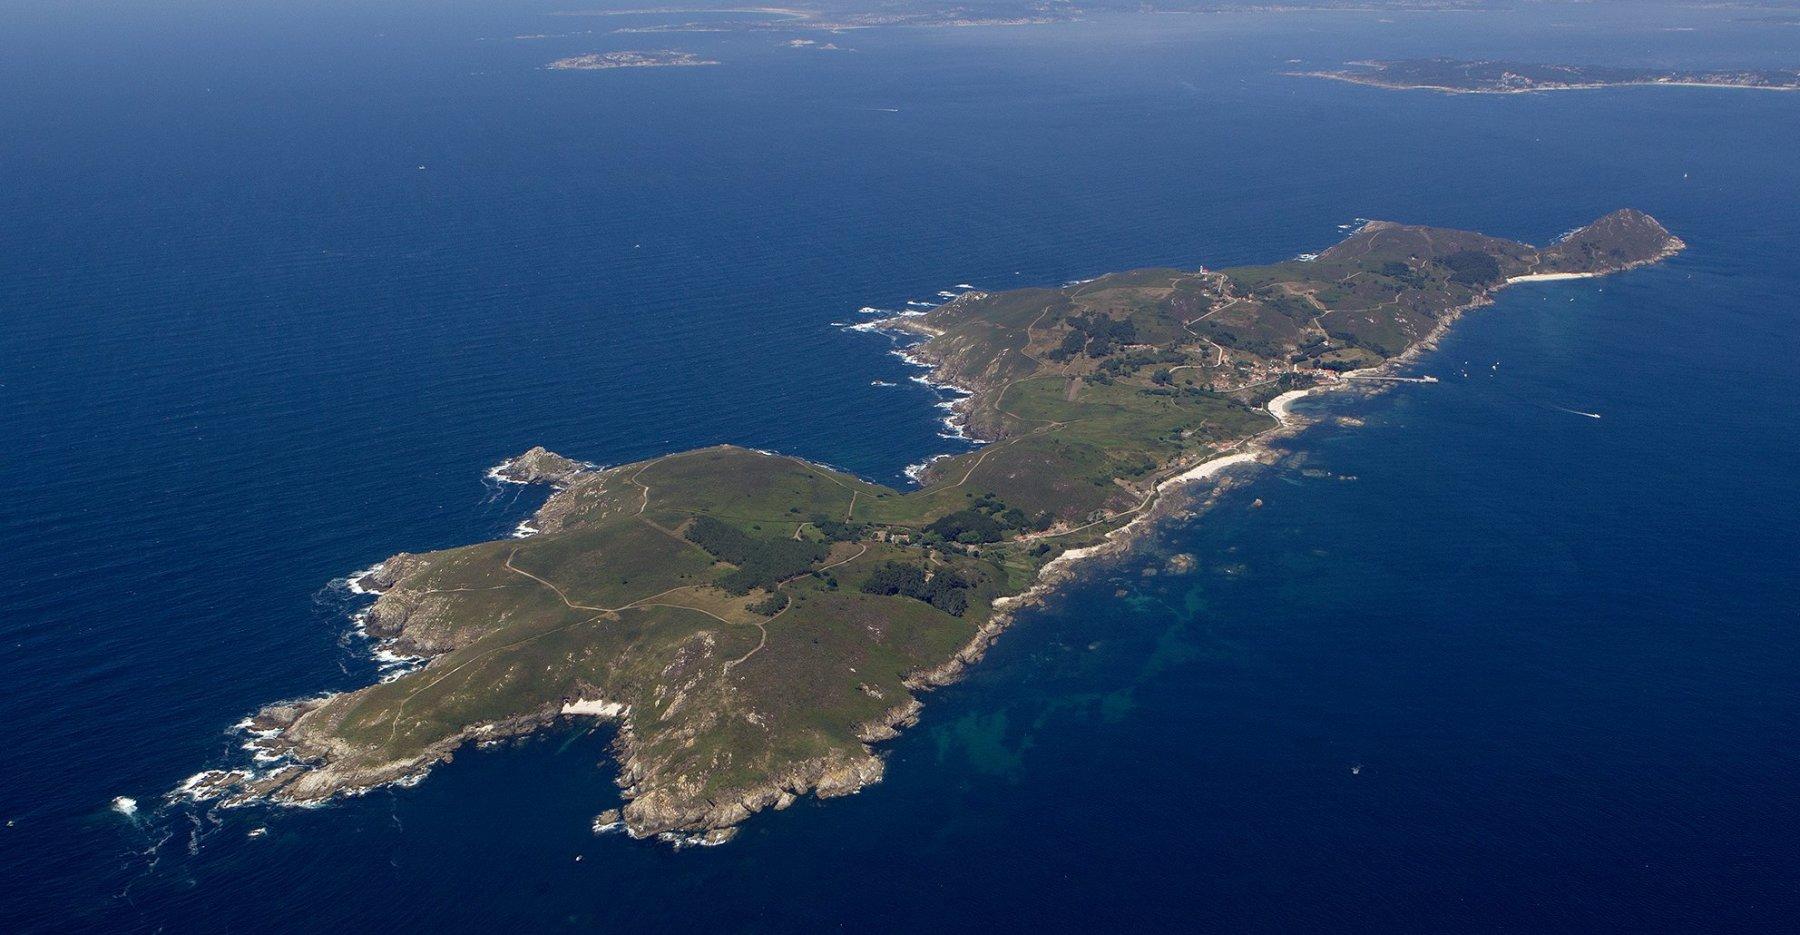 Isla De Ons Mapa.Playas Isla De Ons